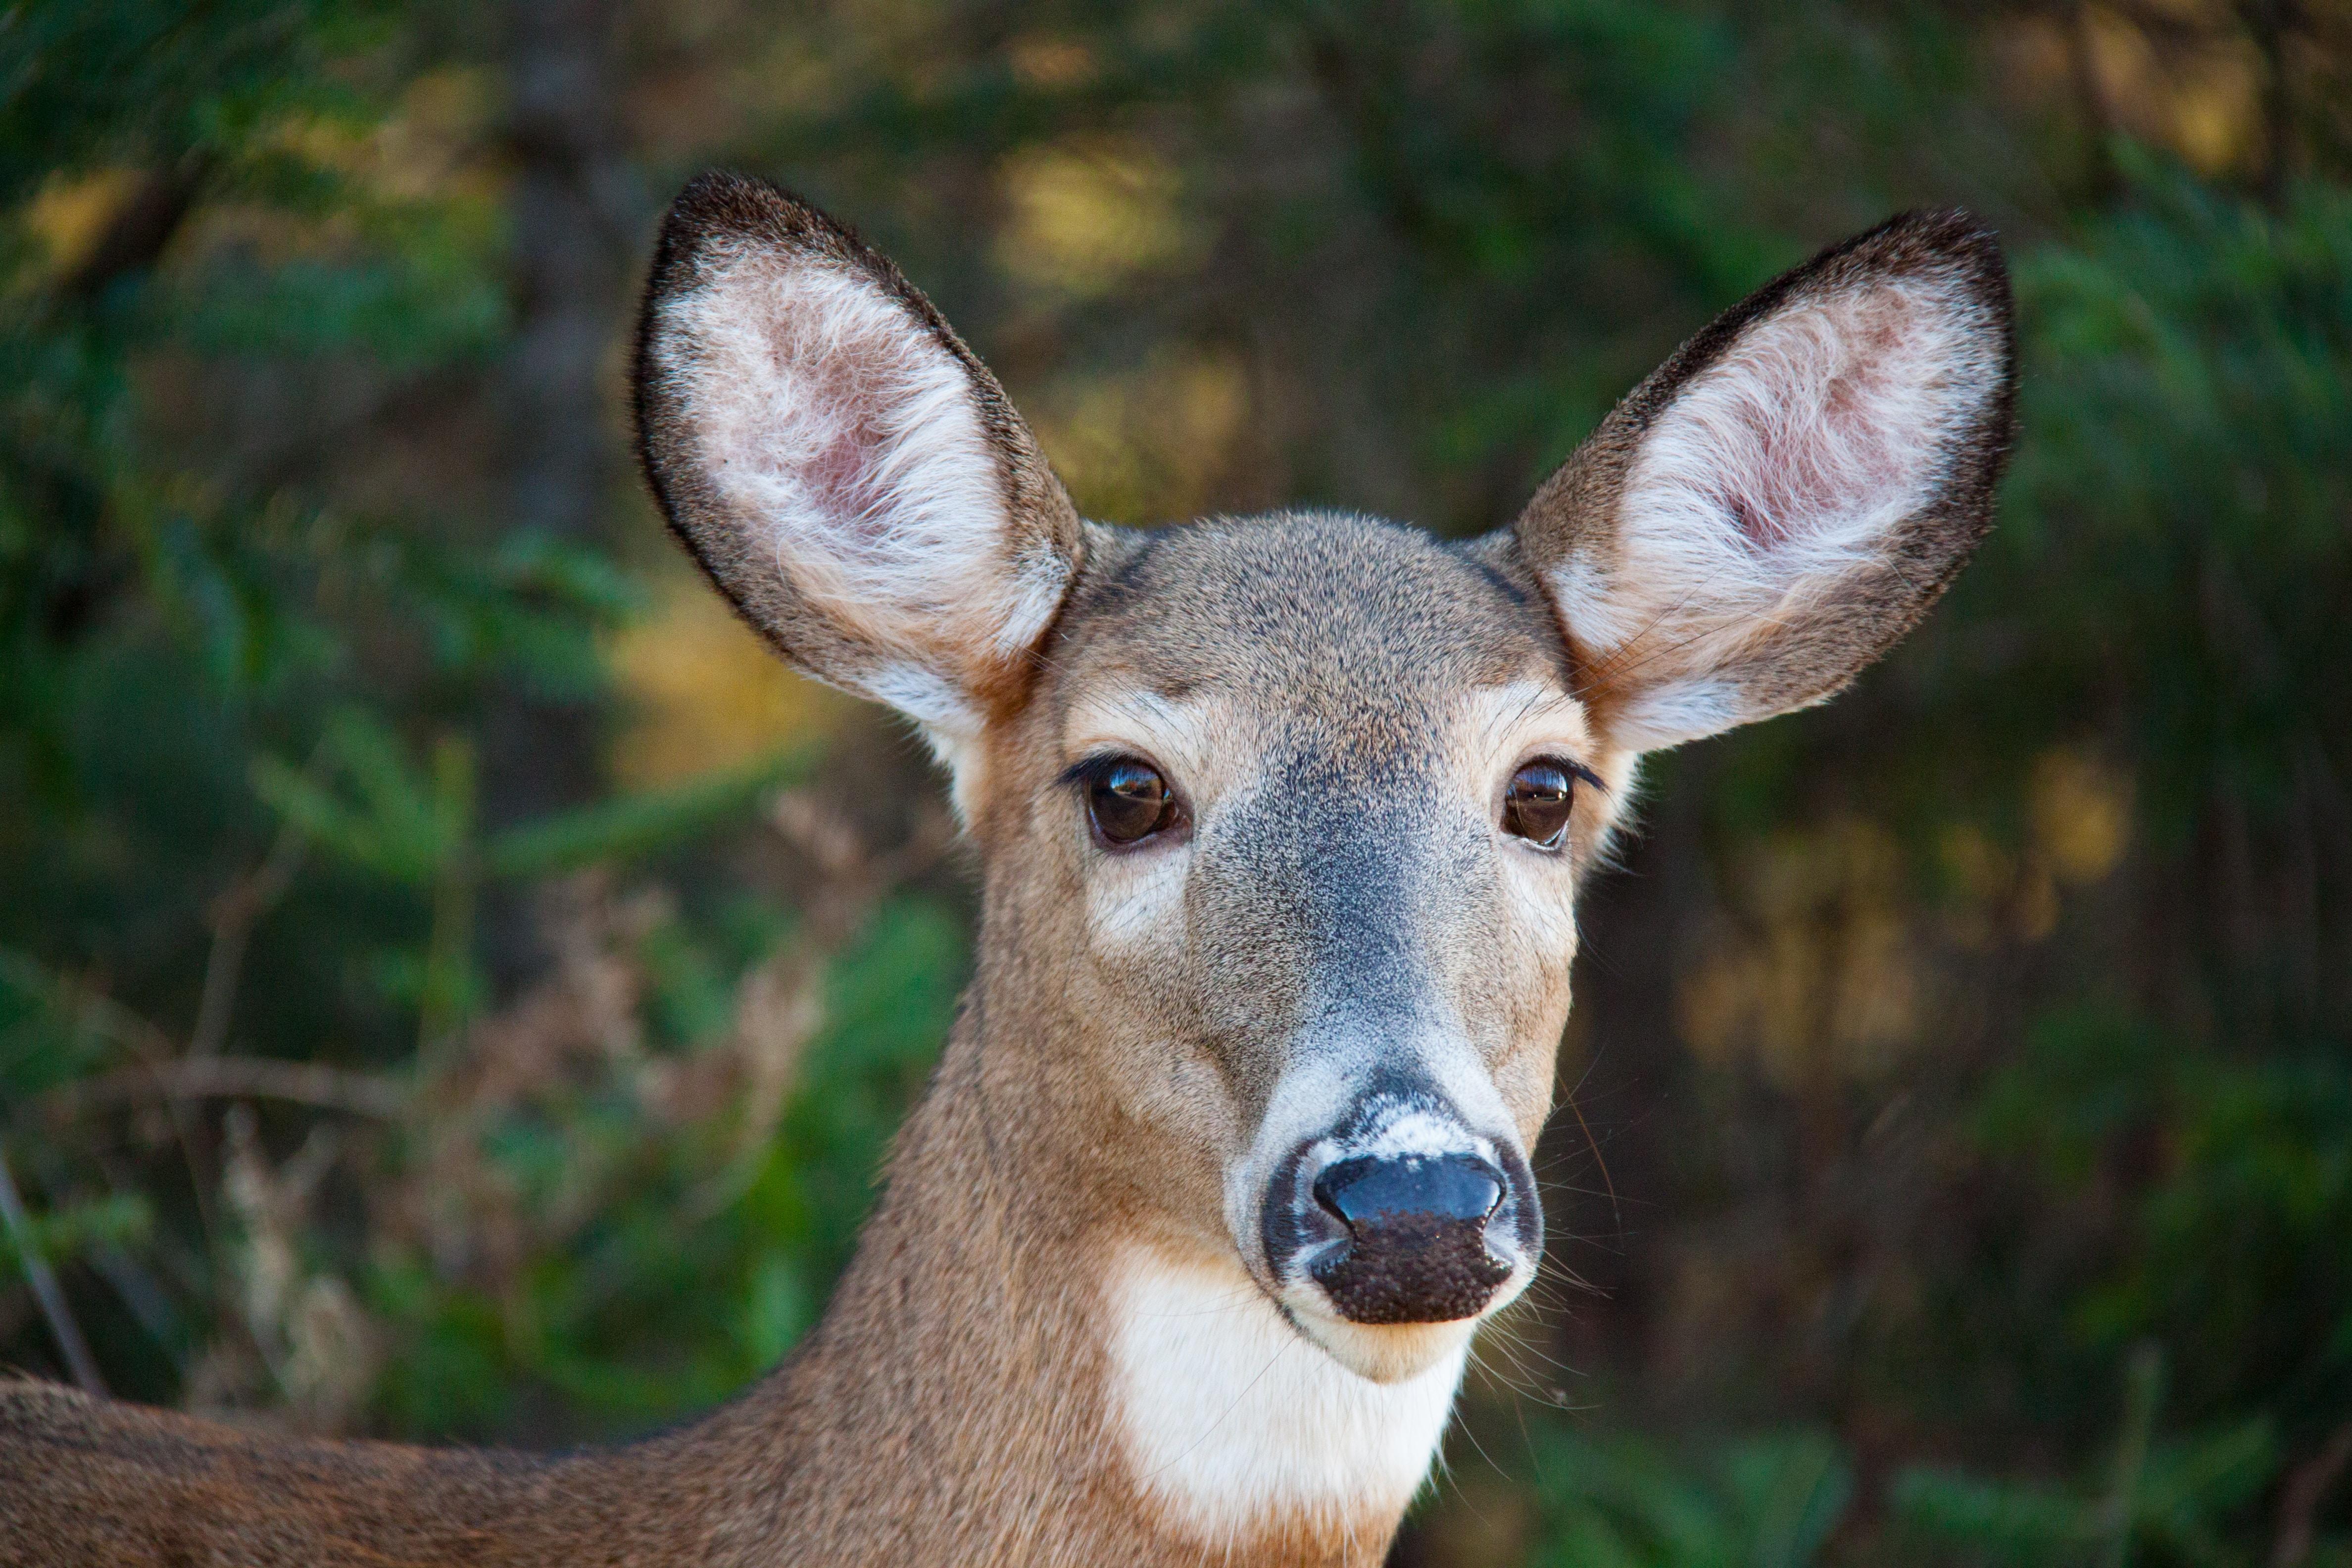 closeup photo of gray deer